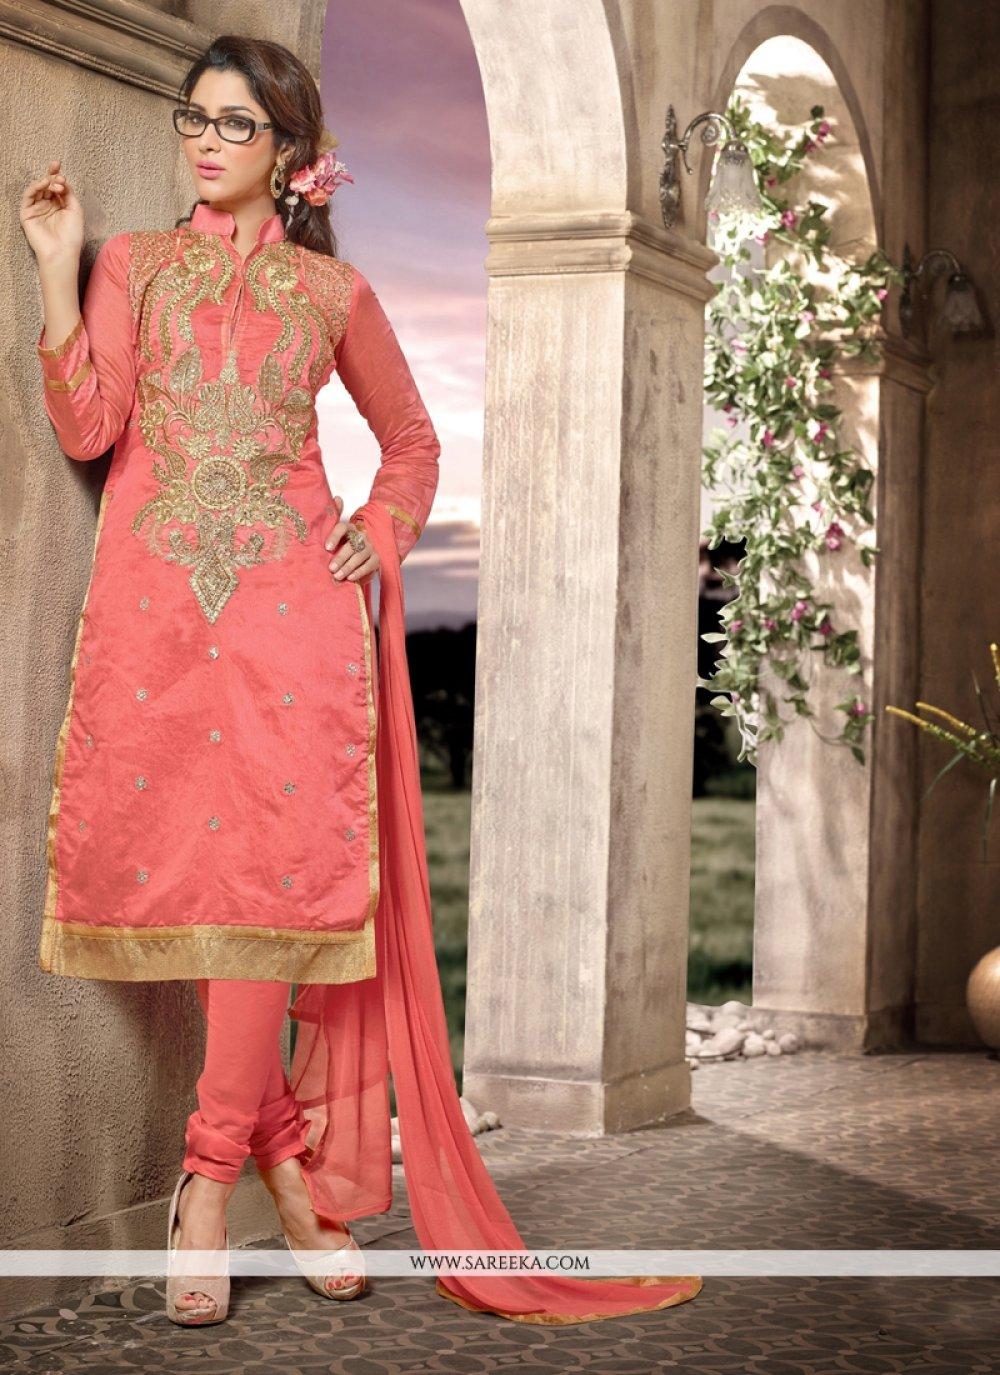 Lace Work Chanderi Peach Churidar Salwar Kameez